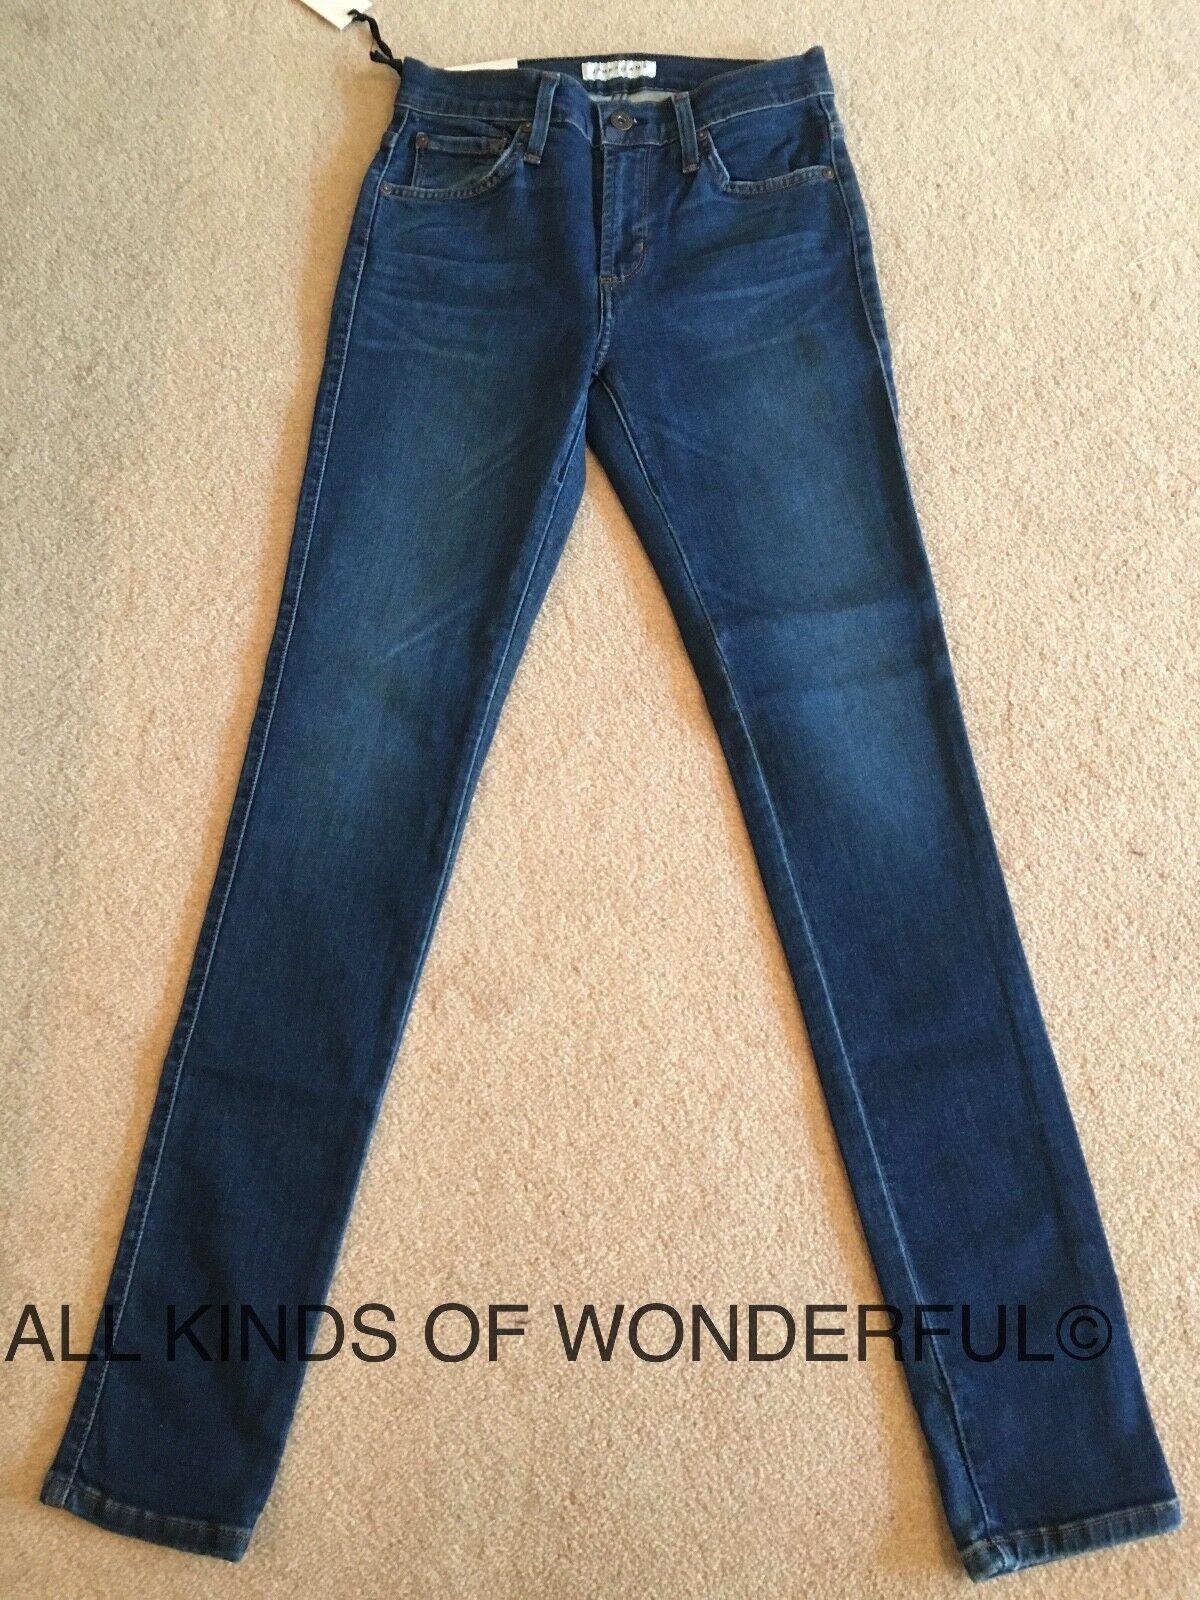 James Jeans Twiggy Skinny Legging in Victory (mid Blau)   BNWT